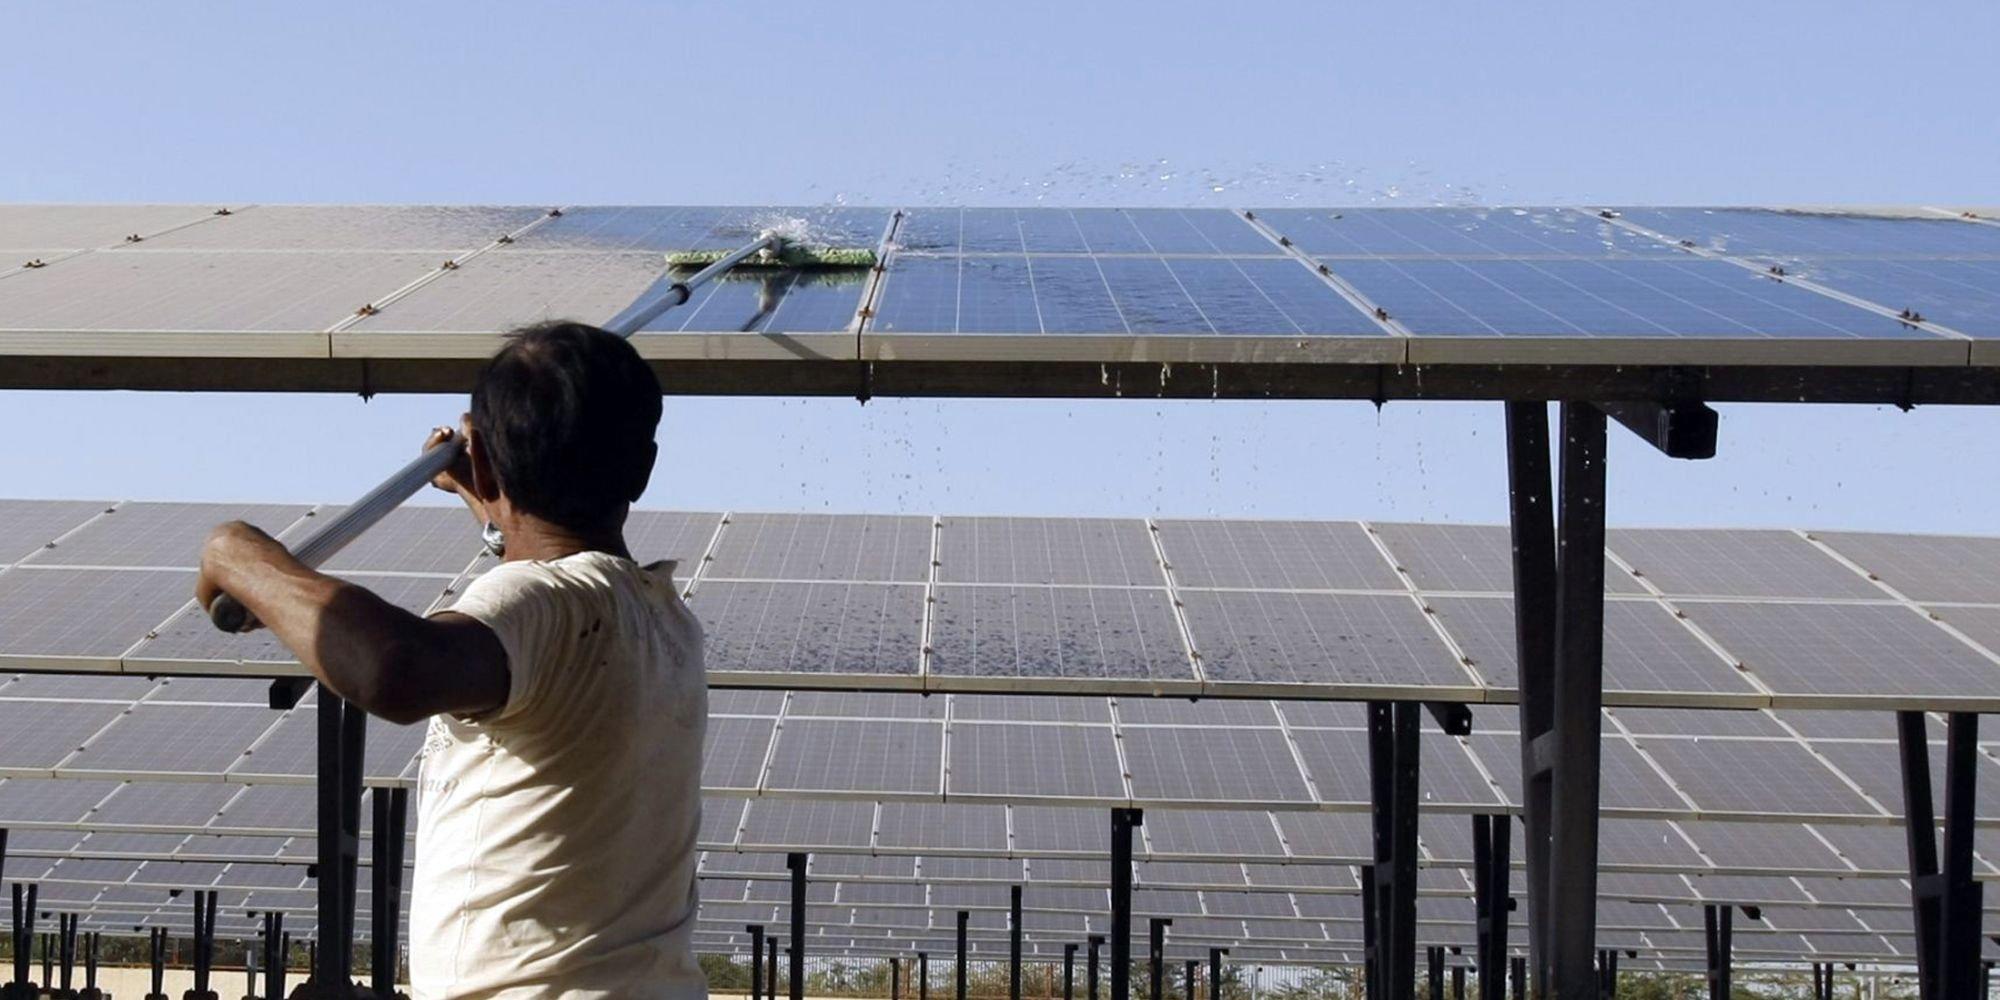 Solar panel cleaning headliner